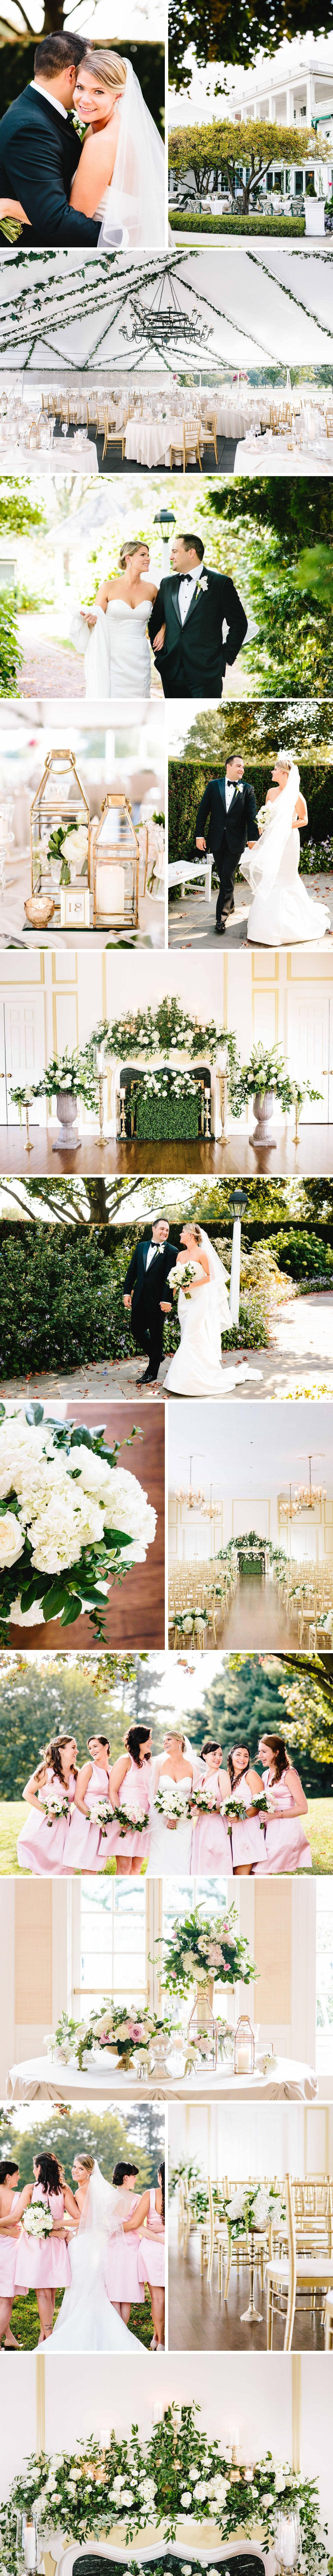 chicago-fine-art-wedding-photography-niemiec3